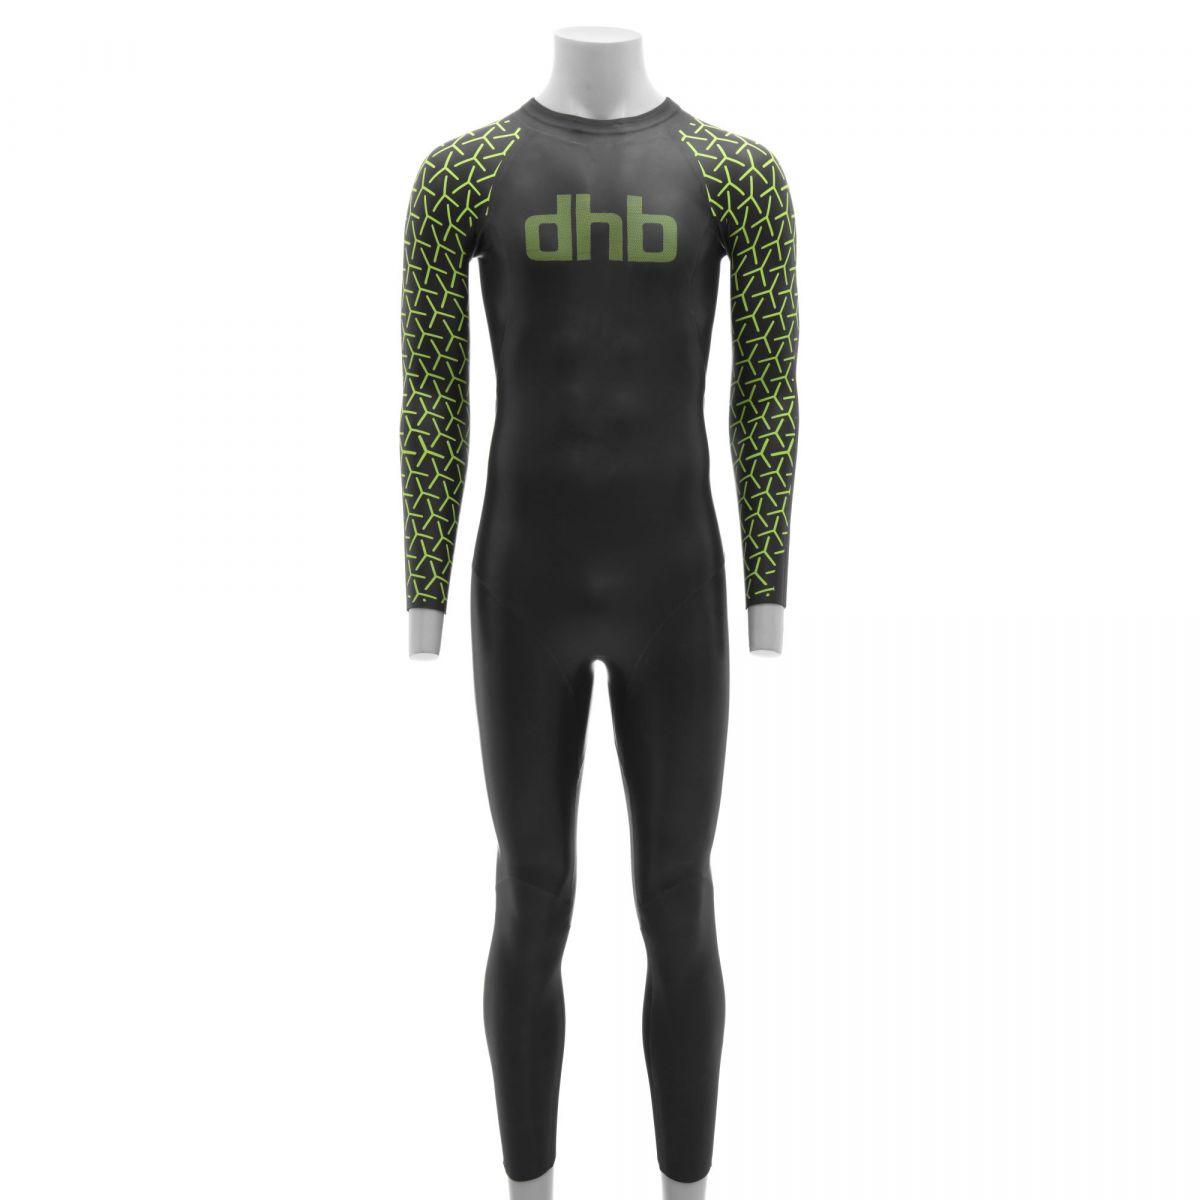 dhb-Blok-Wetsuit-men-front